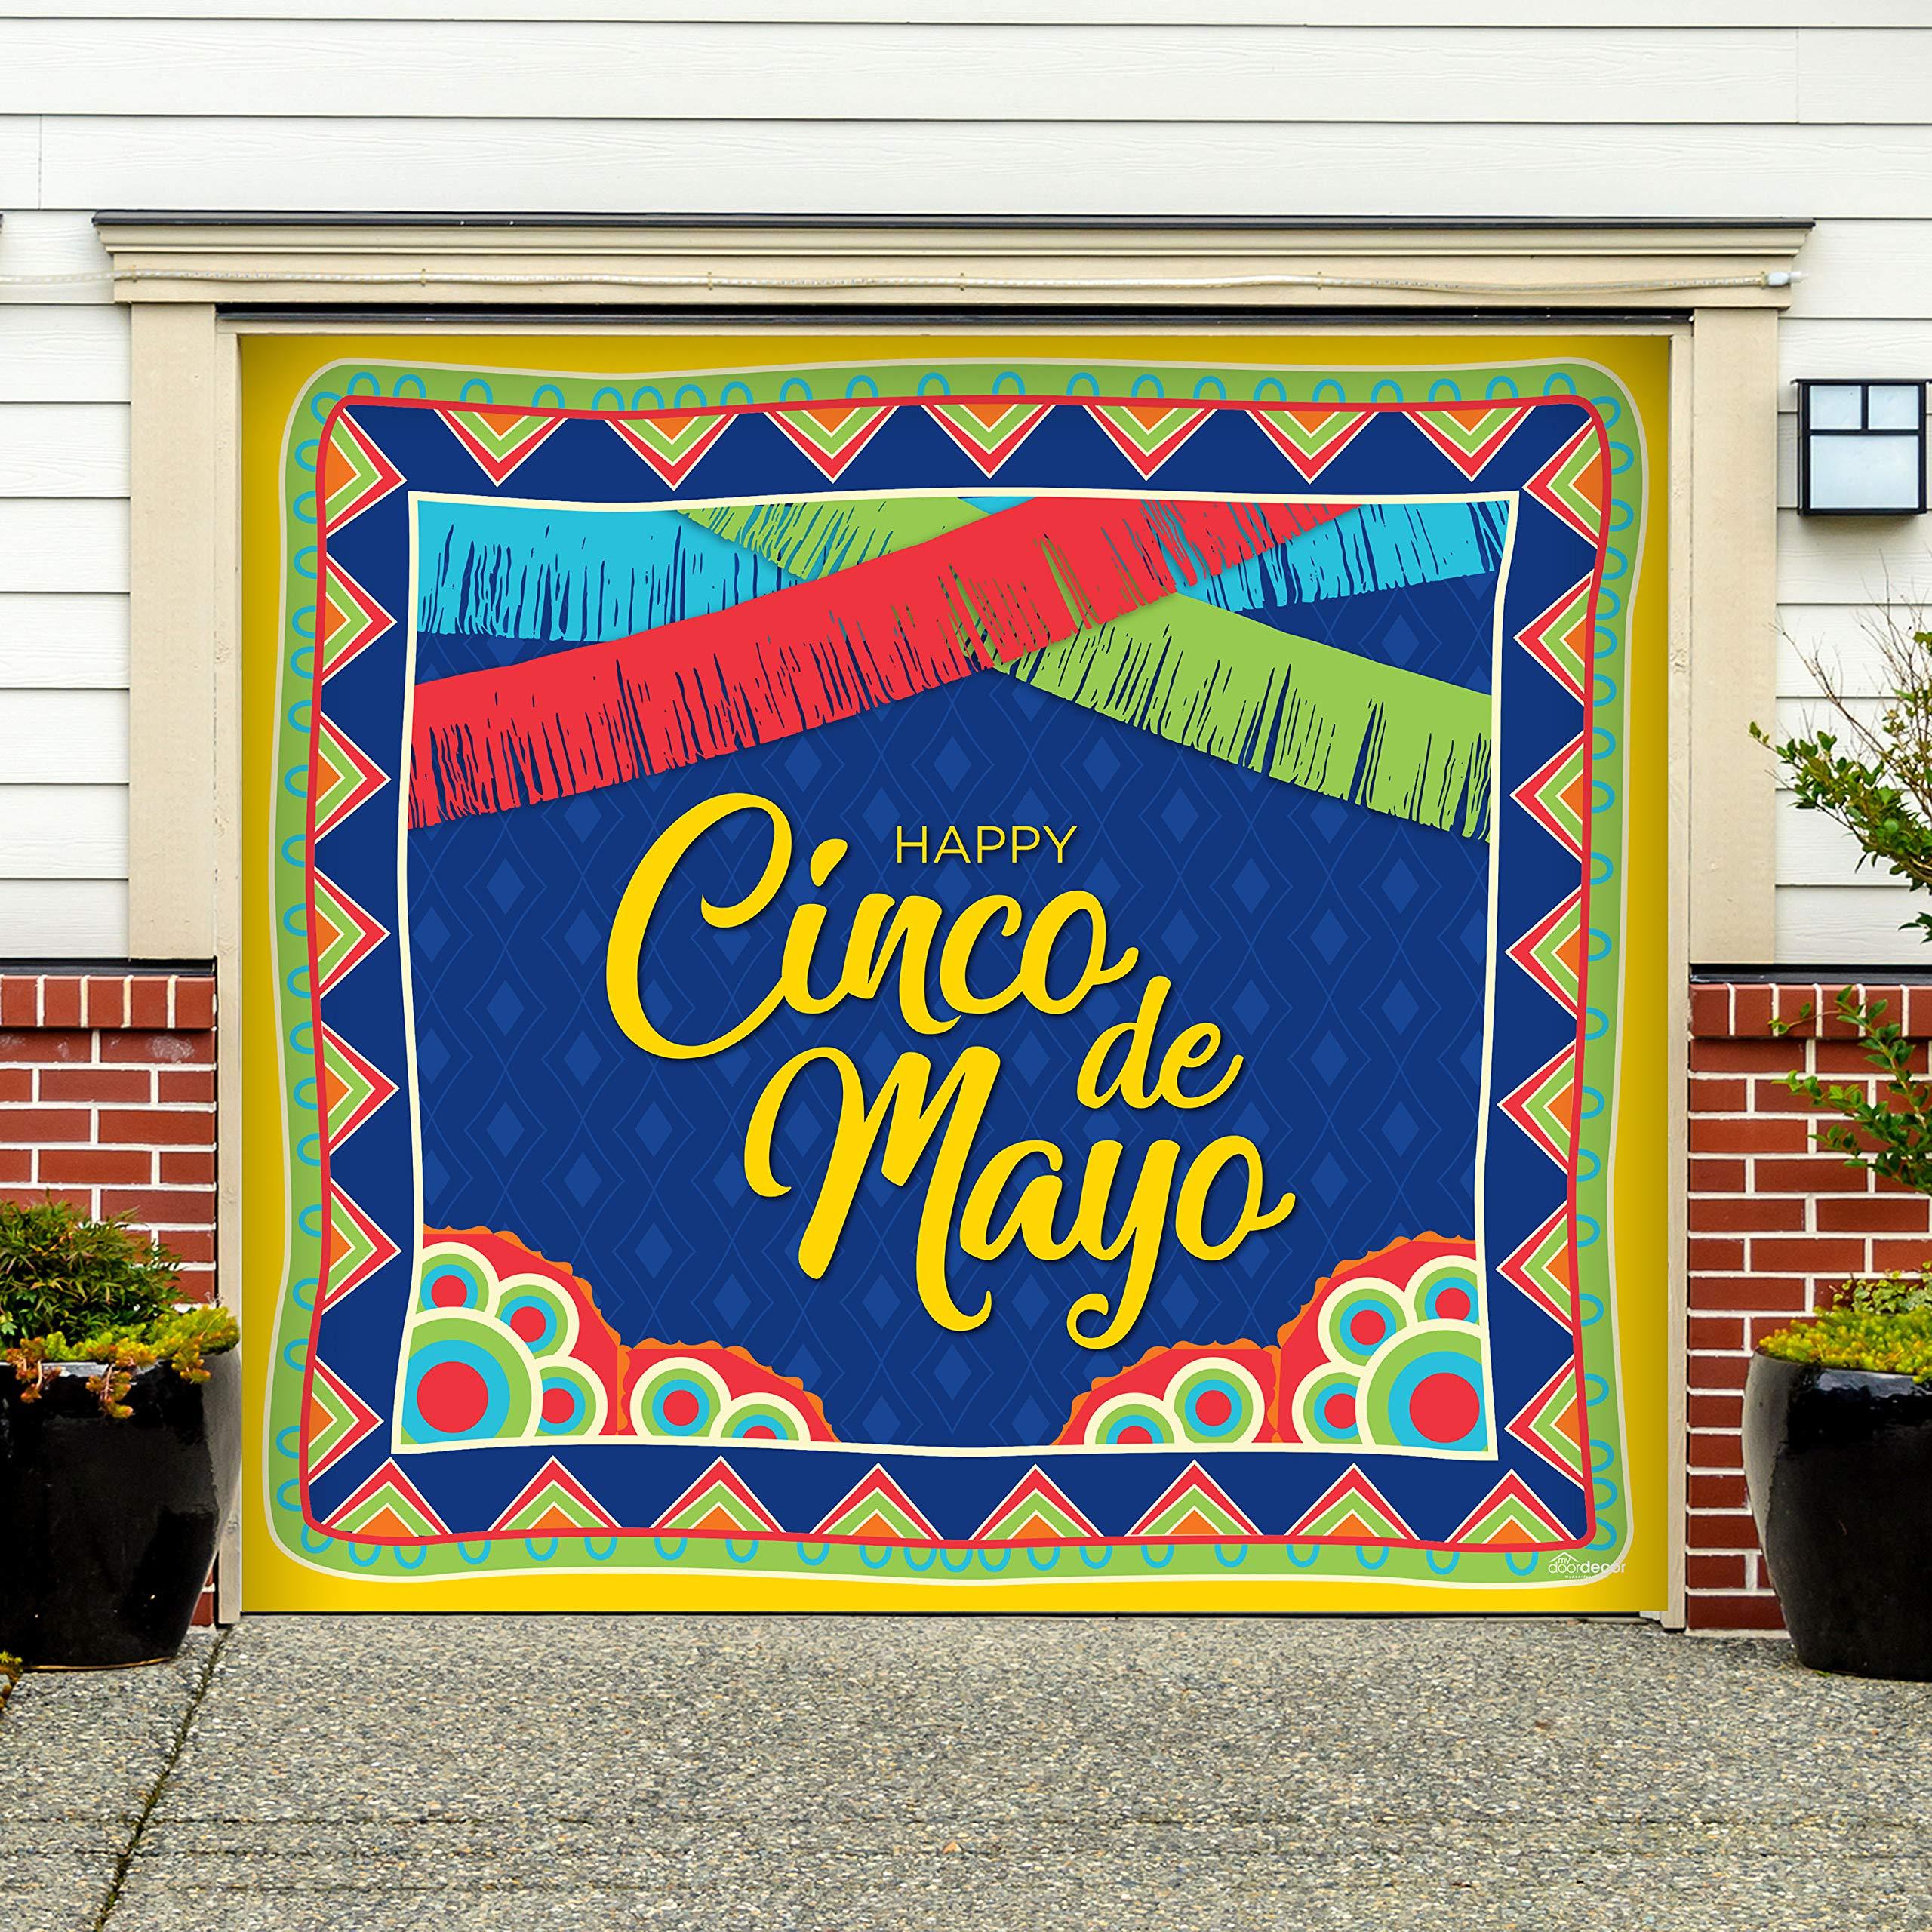 Victory Corps Happy Cinco de Mayo Pattern - Holiday Garage Door Banner Mural Sign Décor 7'x 8' Car Garage - The Original Holiday Garage Door Banner Decor